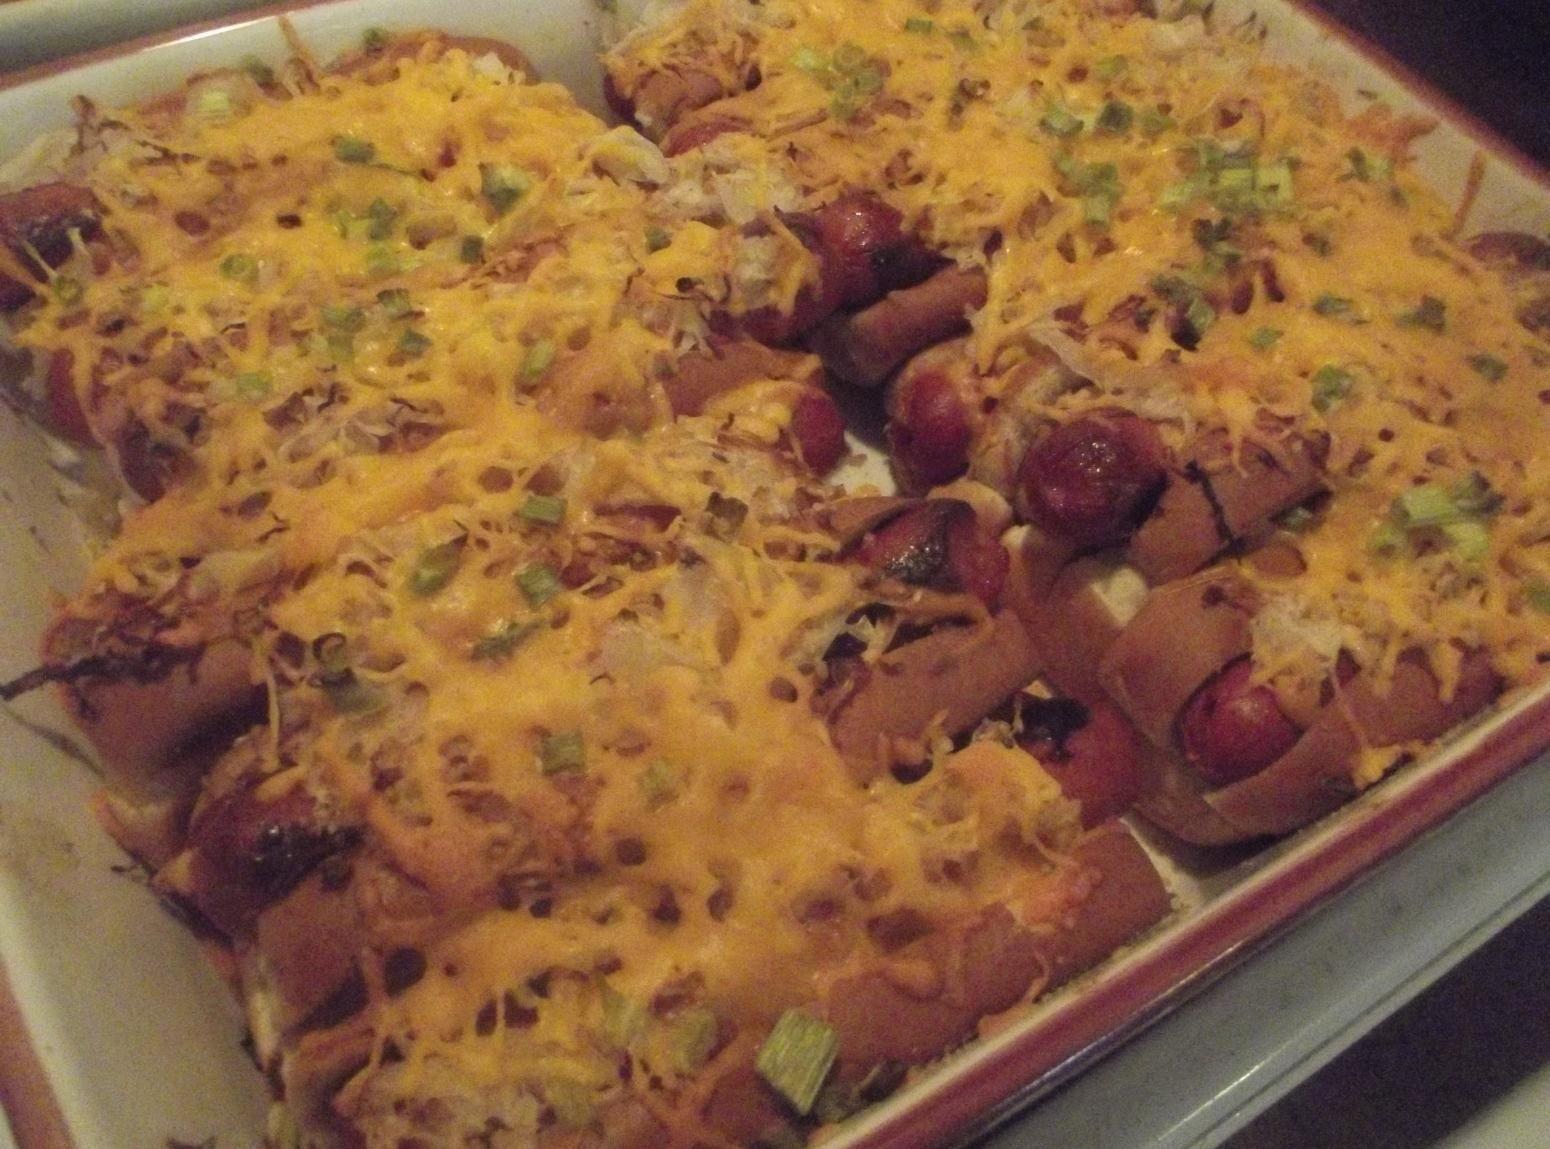 Hot dogs with sauerkraut and cheese hot dogs sauerkraut